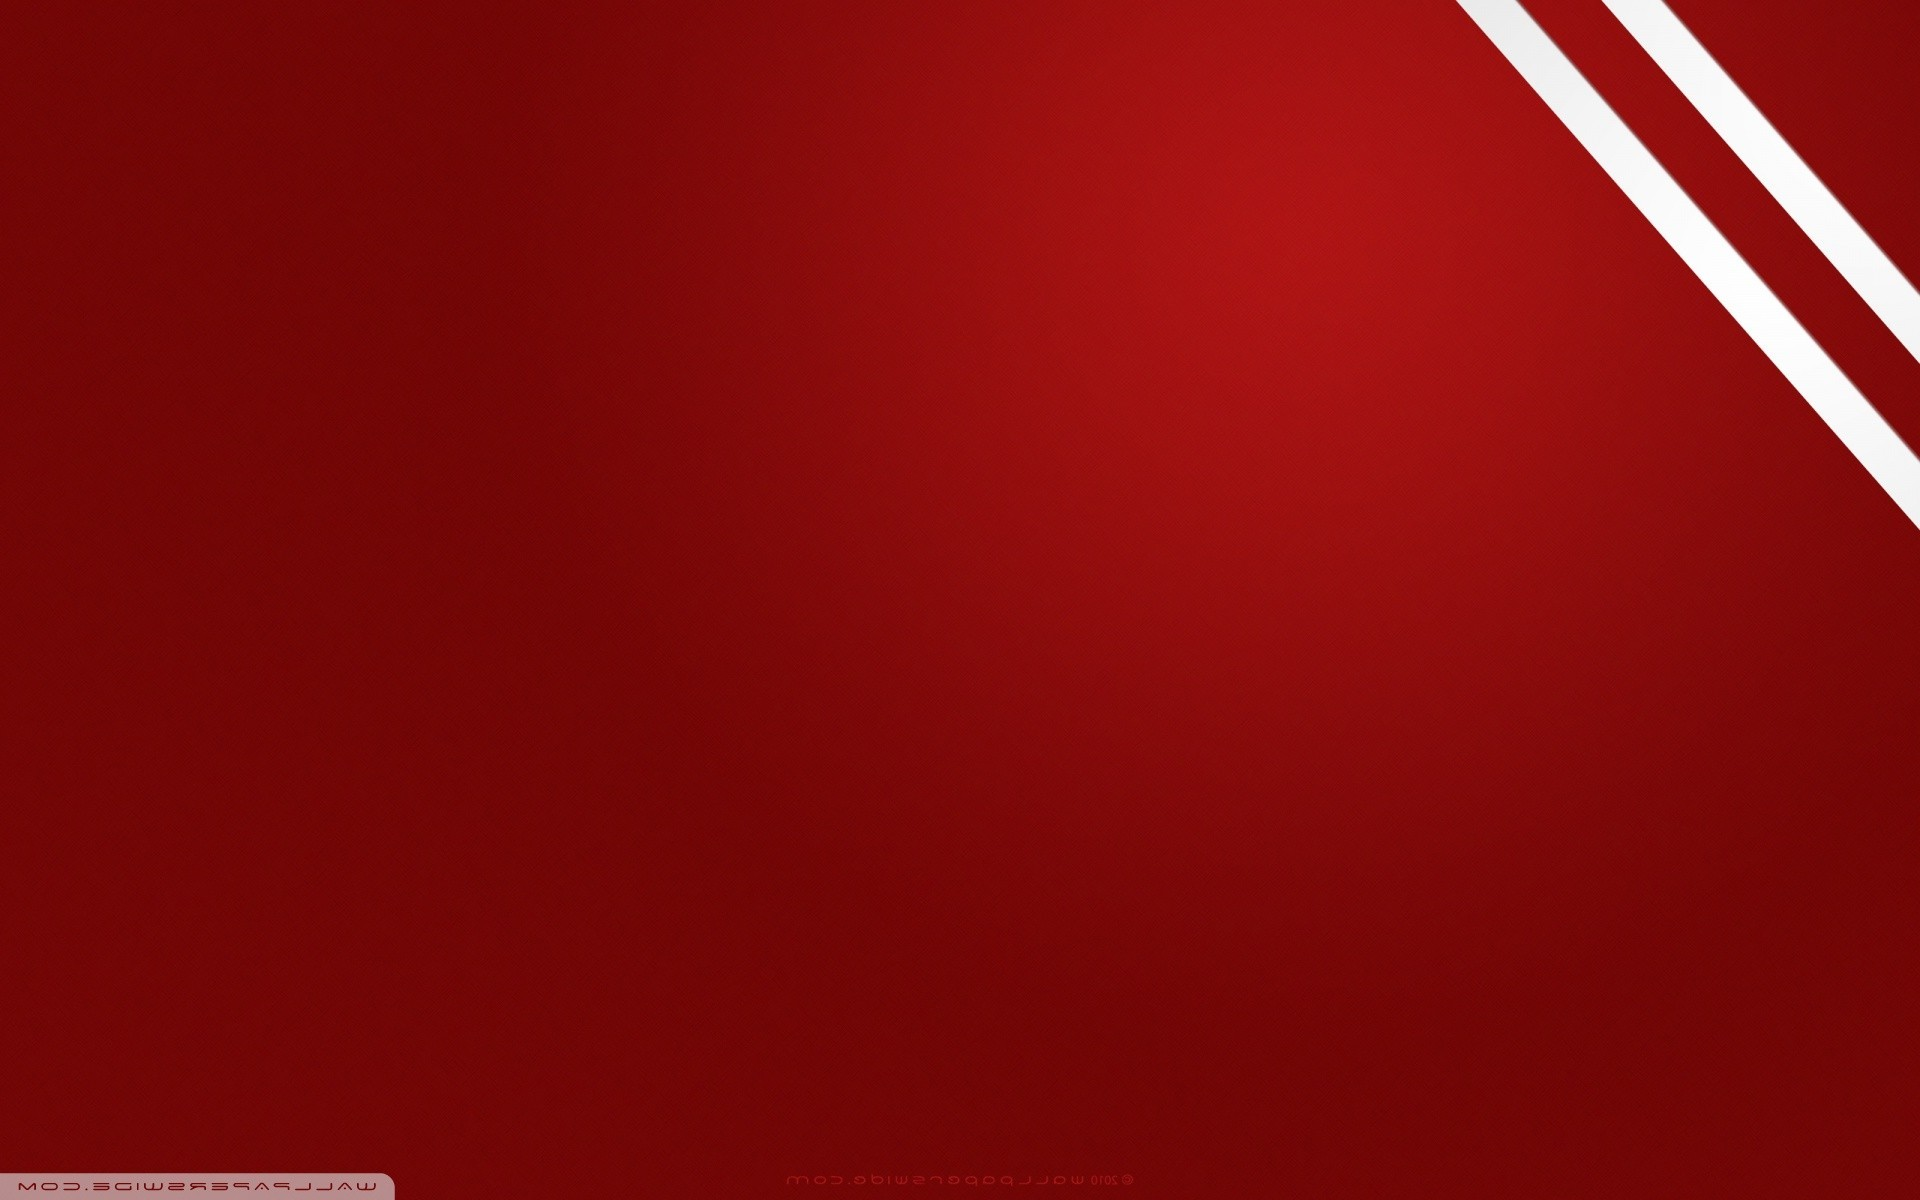 v9MEqO - Red And White Wedding Dresses